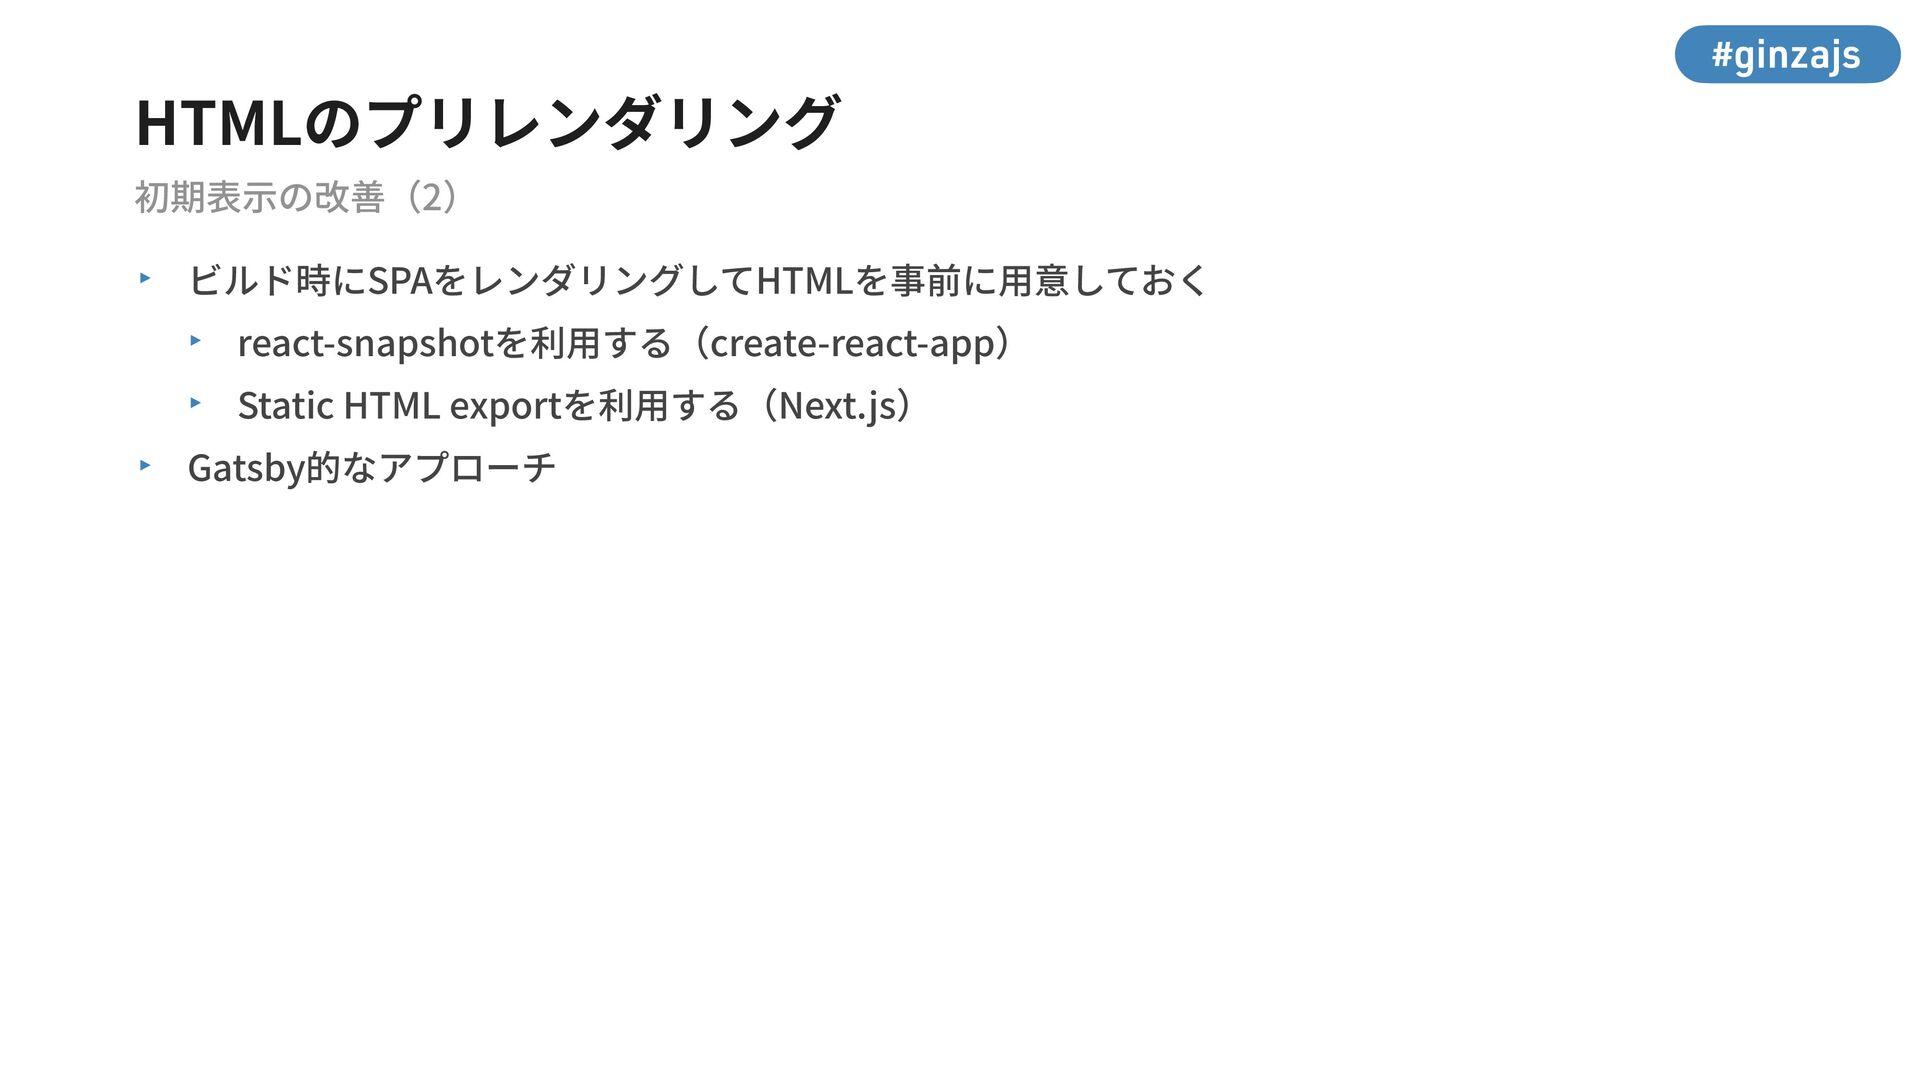 #ginzajs HTMLのプリレンダリング 初期表⽰の改善(2) ‣ ビルド時にSPAをレン...